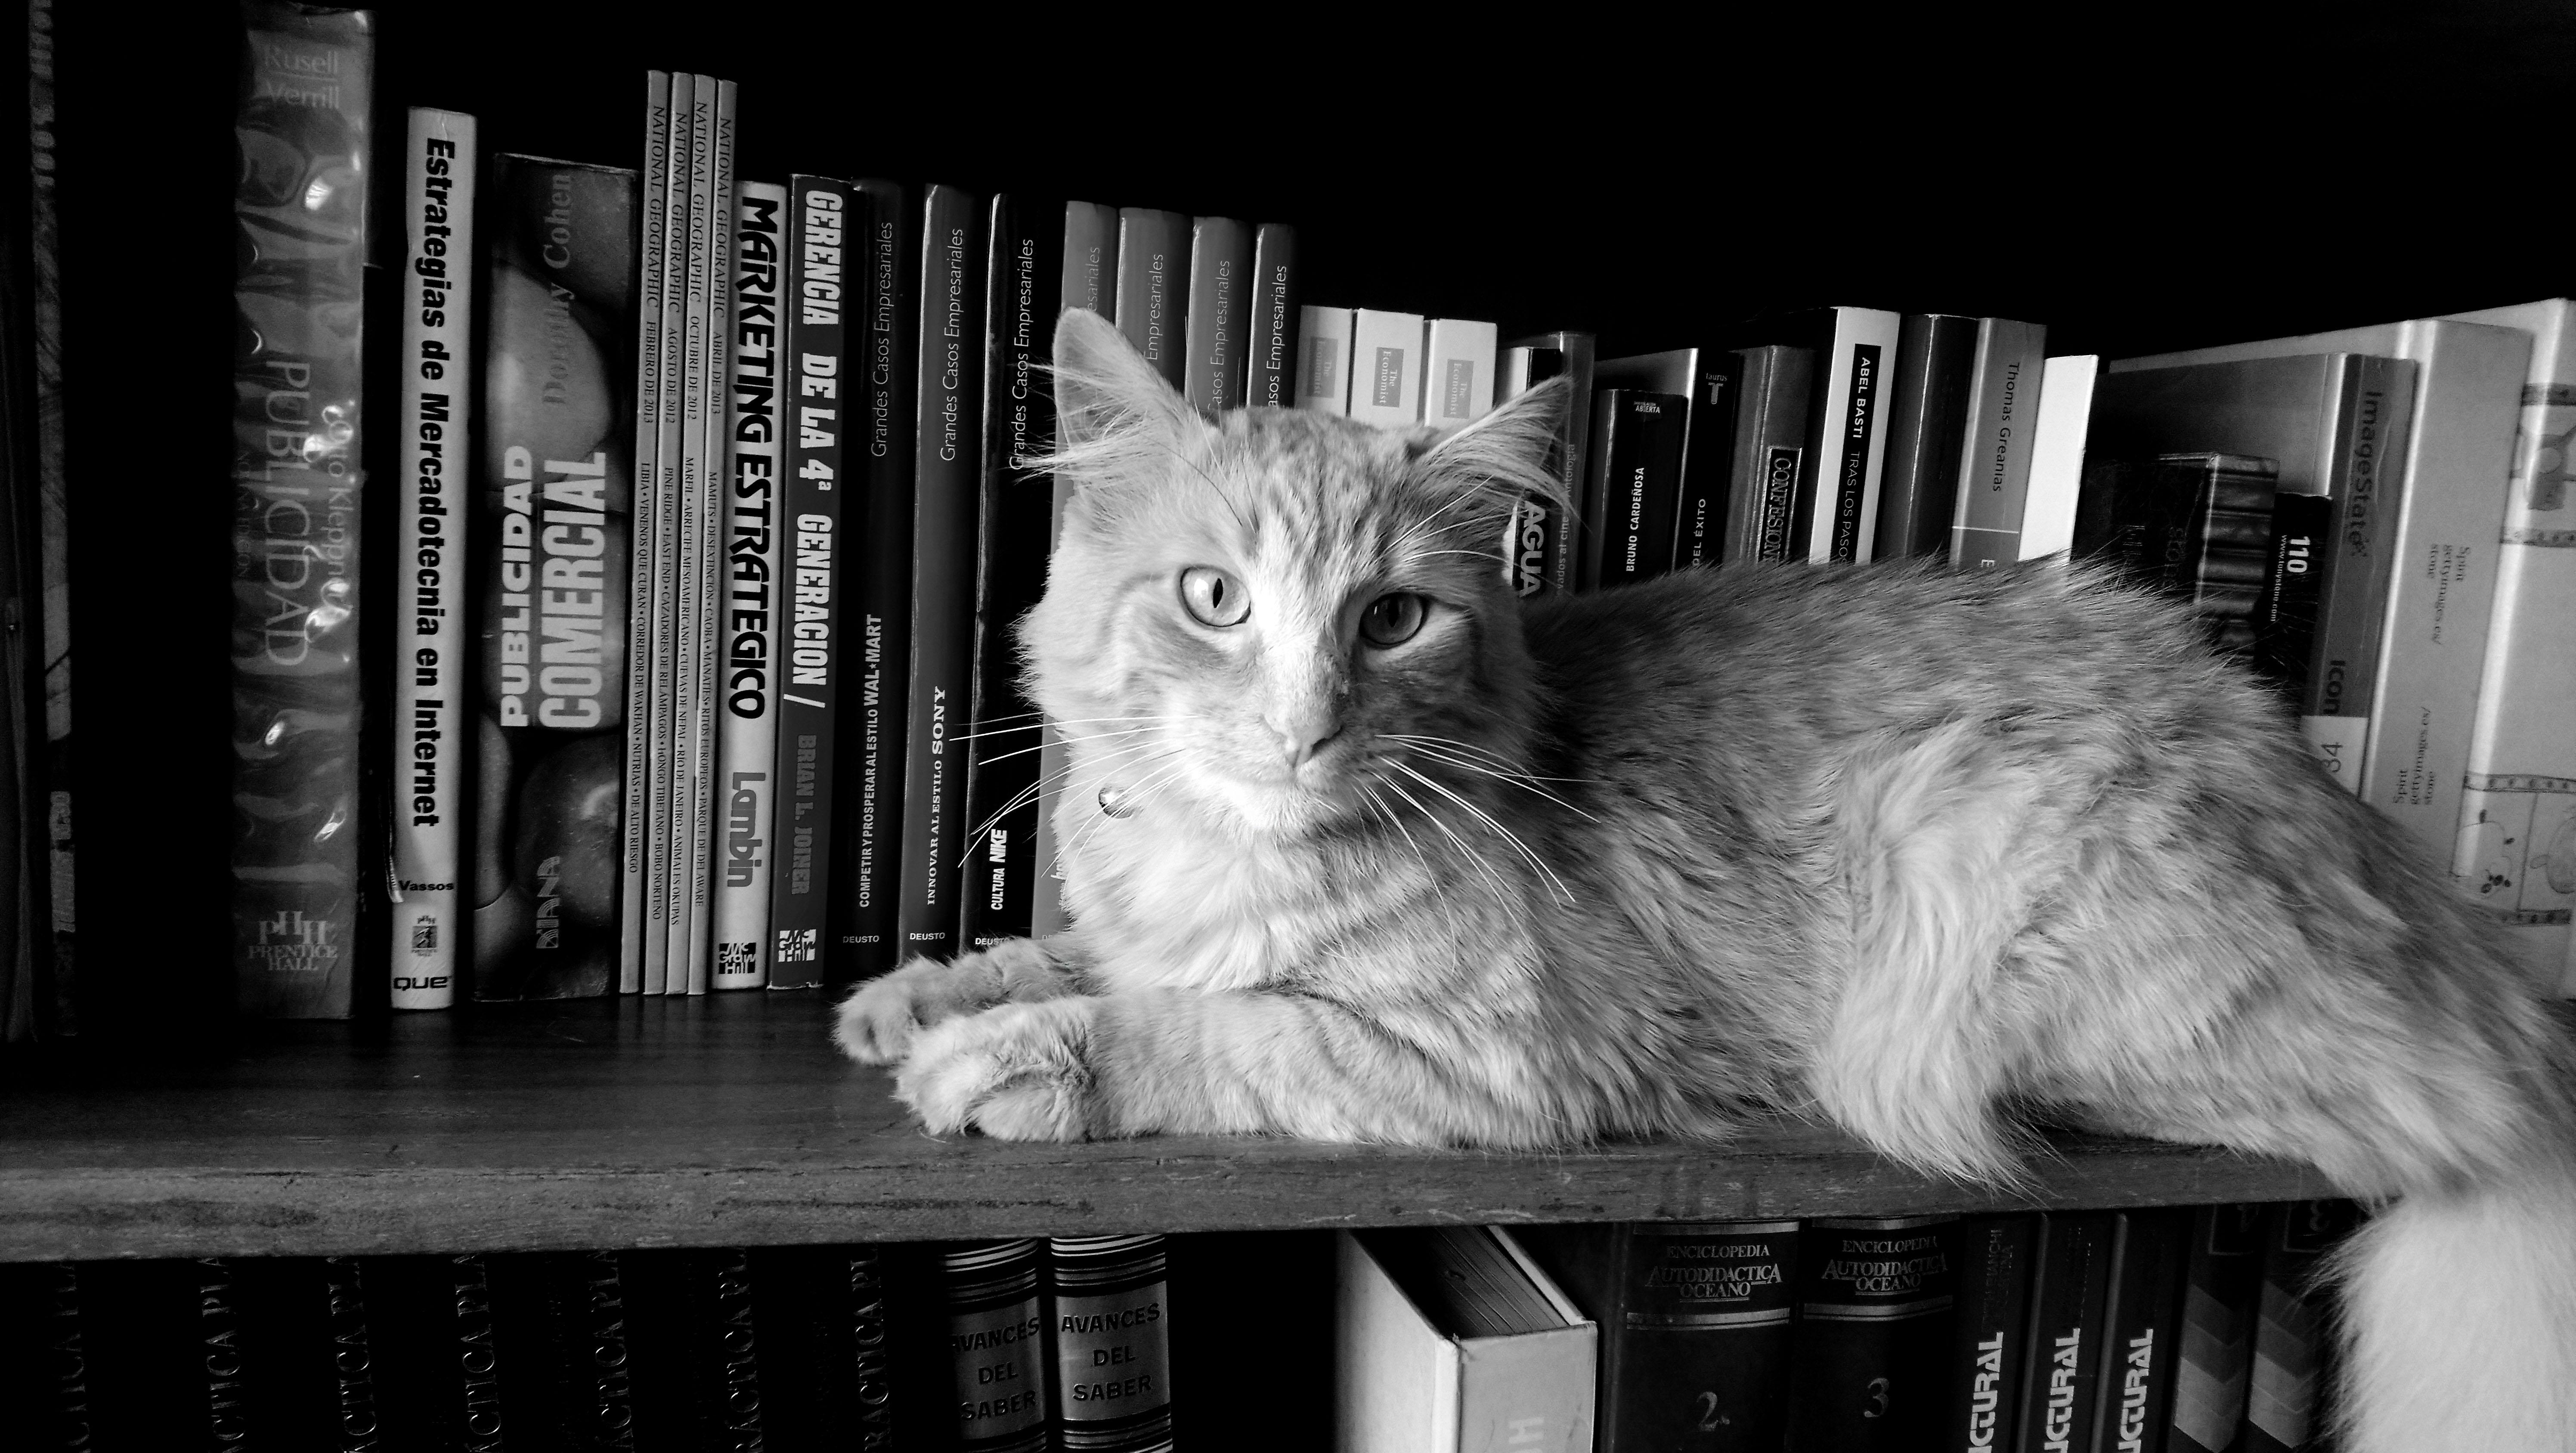 4e1d329da3e8 Γάτα βιβλία μαύρος μαύρο και άσπρο θηλαστικό ζώο μικρού και μεσαίου  μεγέθους γάτες σπονδυλωτό φαβορίτα μονόχρωμη